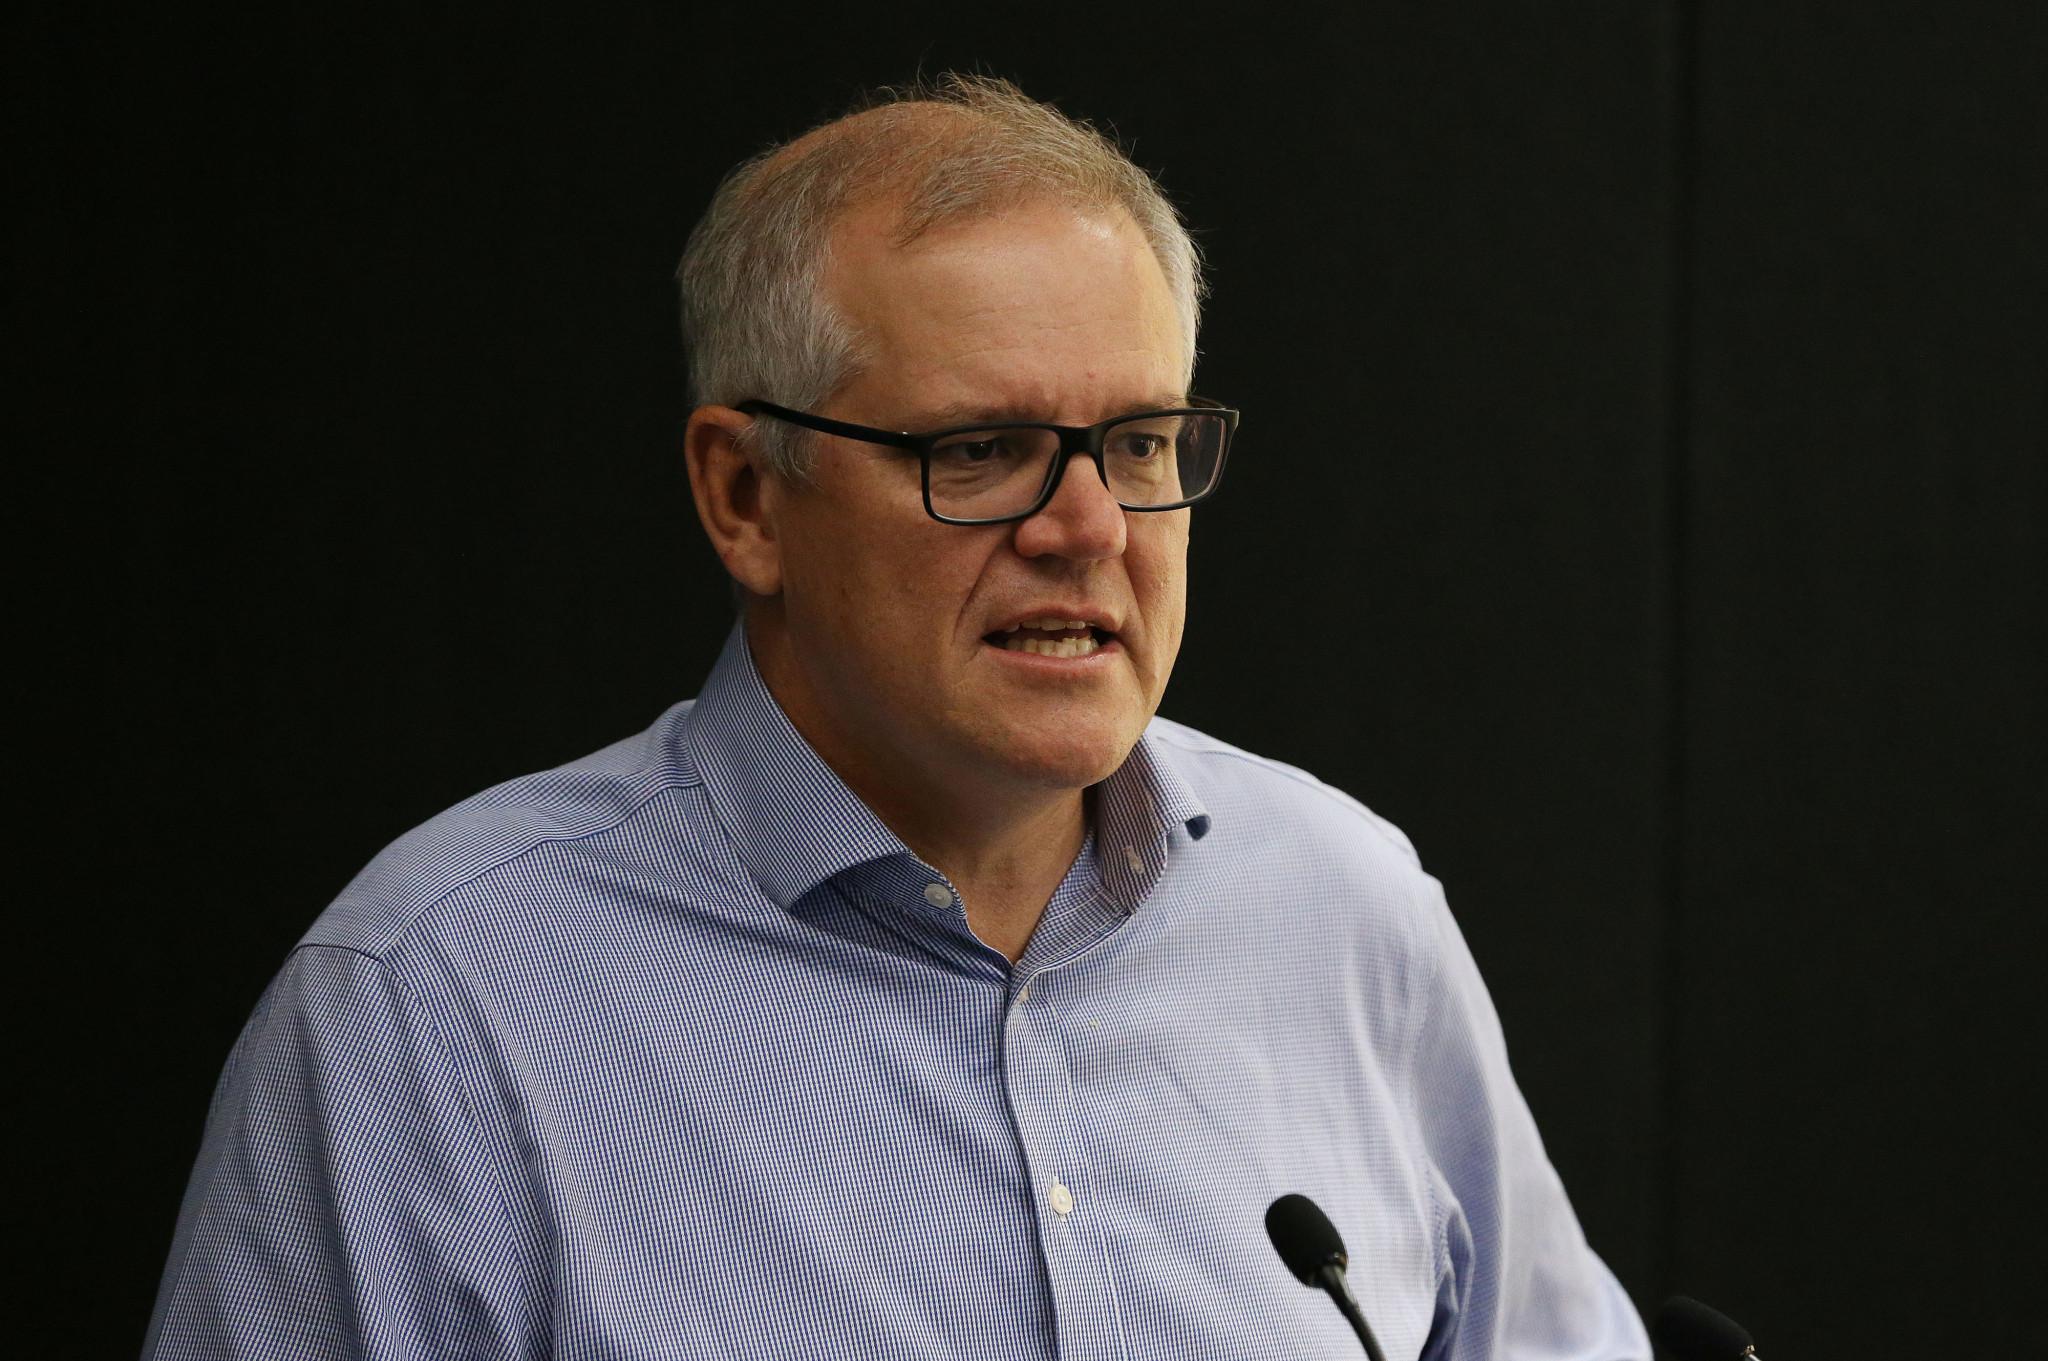 Australian Prime Minister confirms funding guarantees for Brisbane 2032